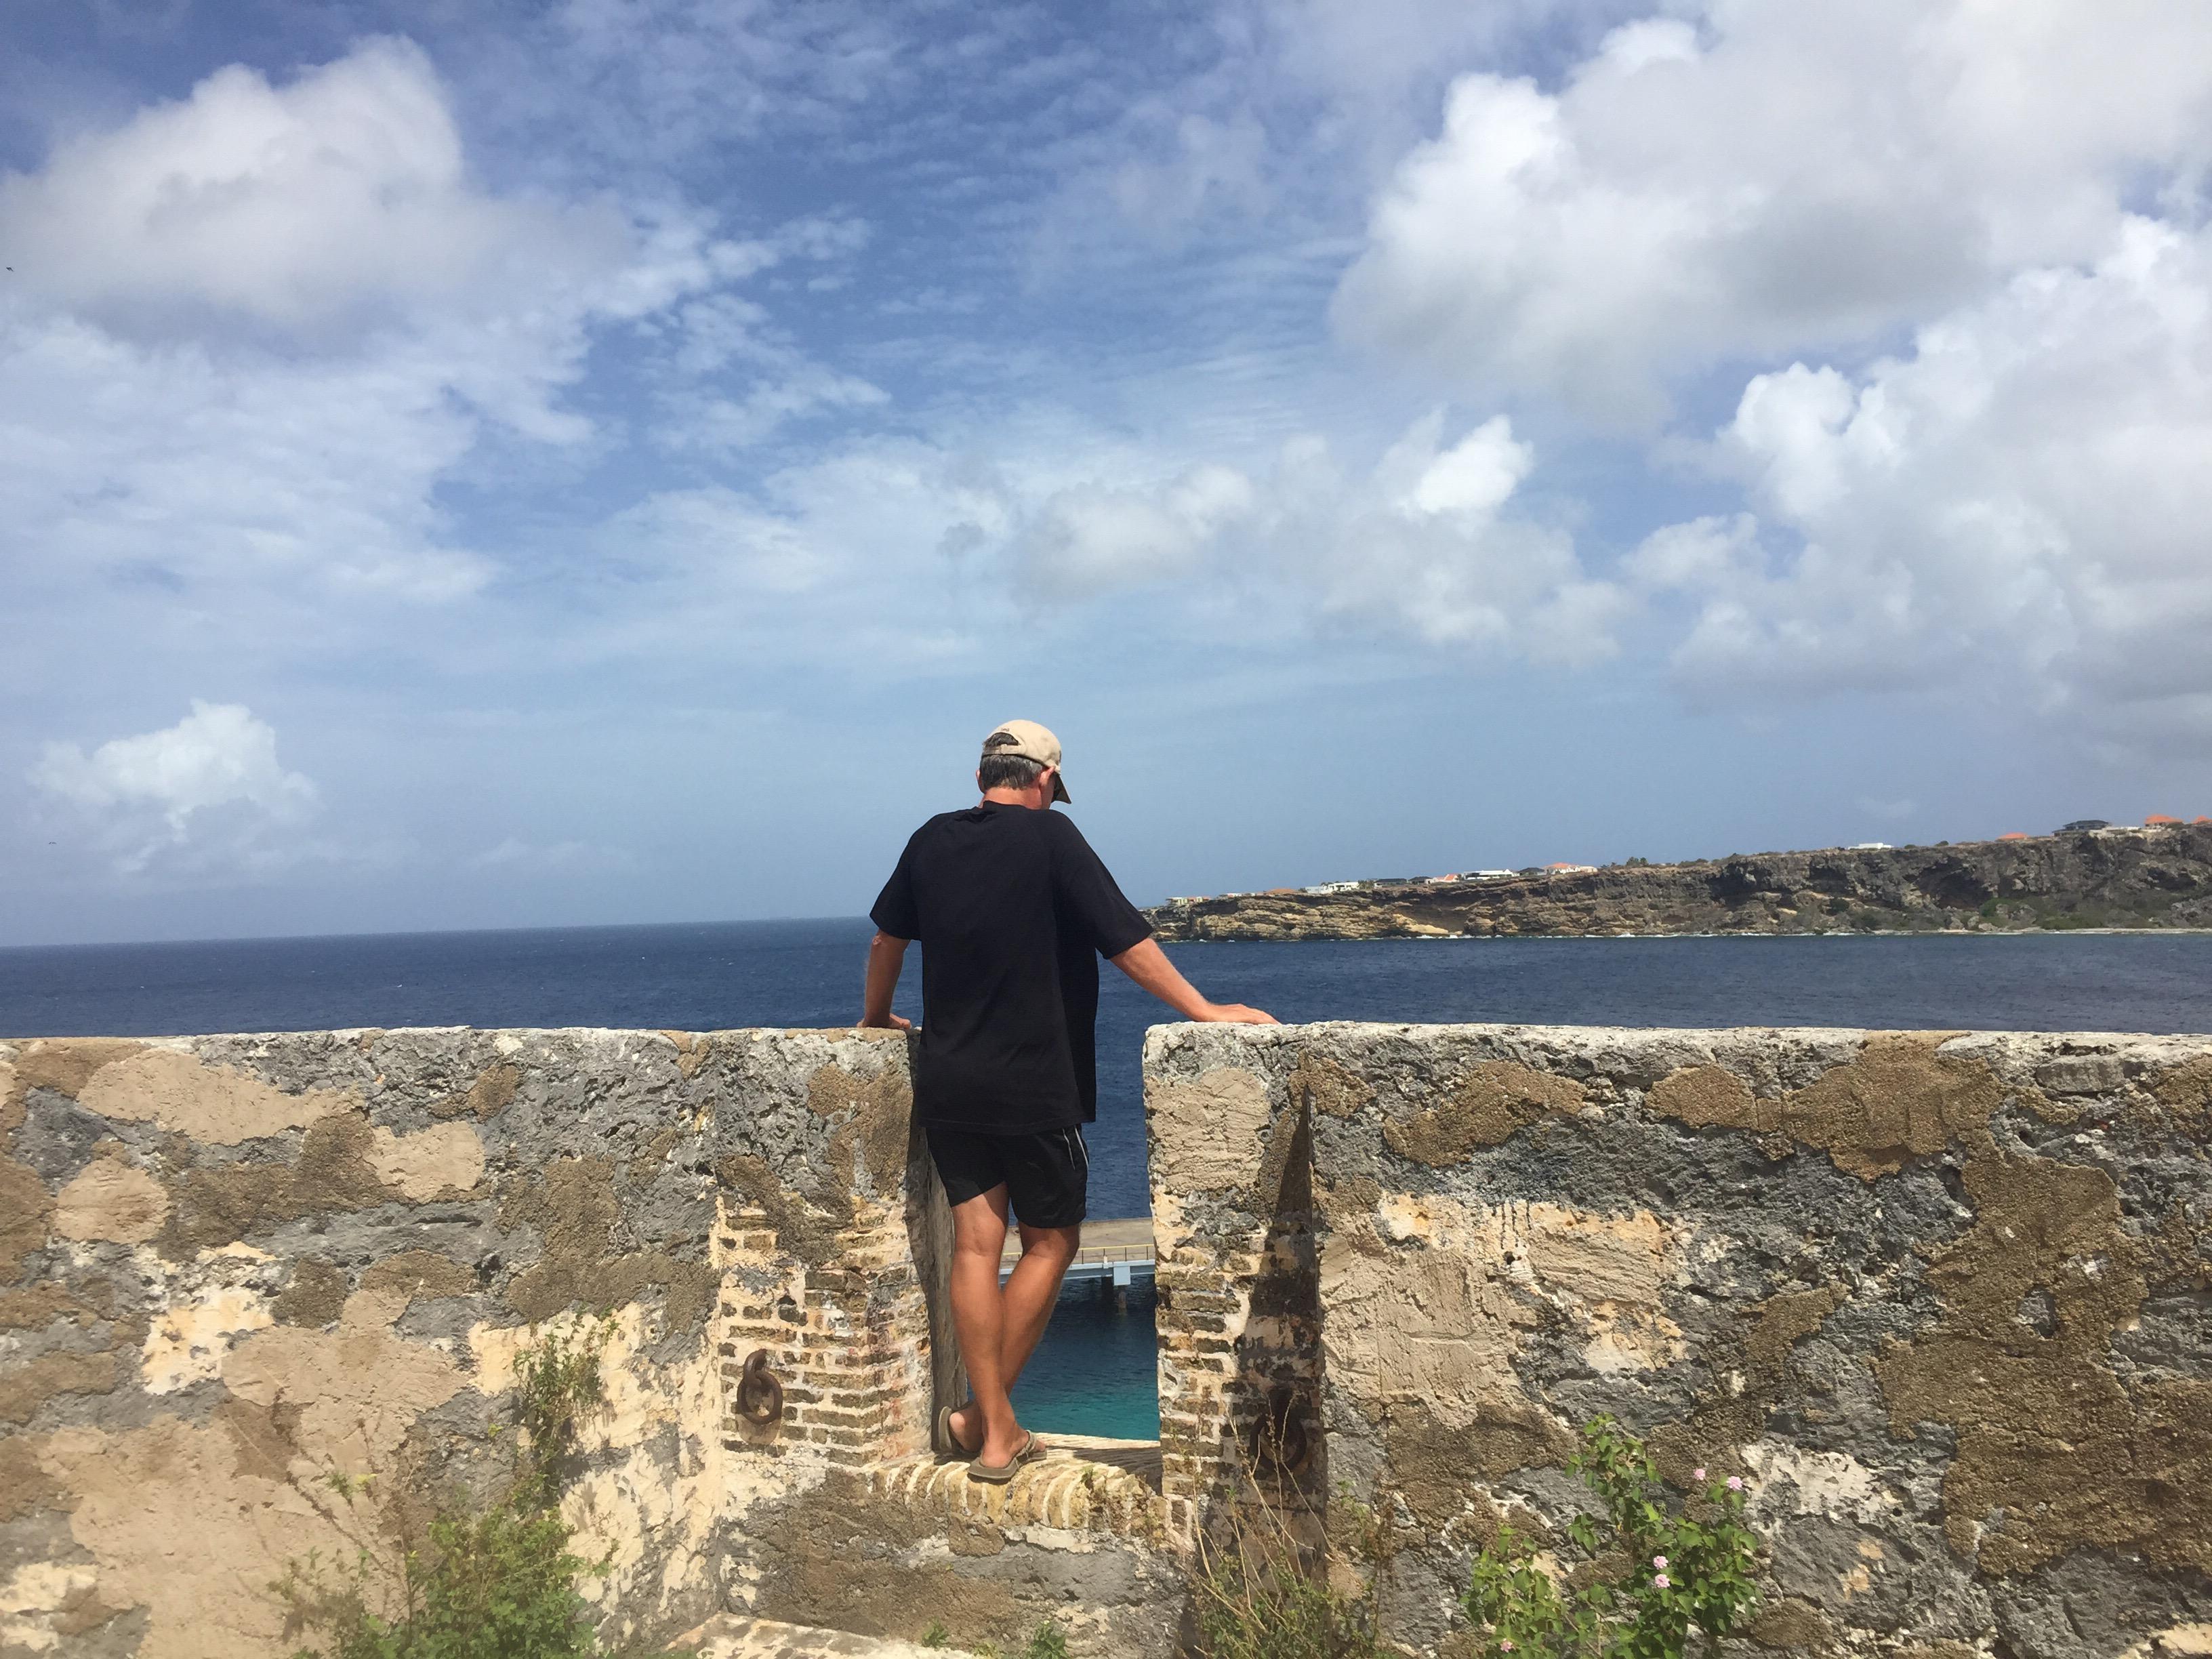 Wayne admiring the view